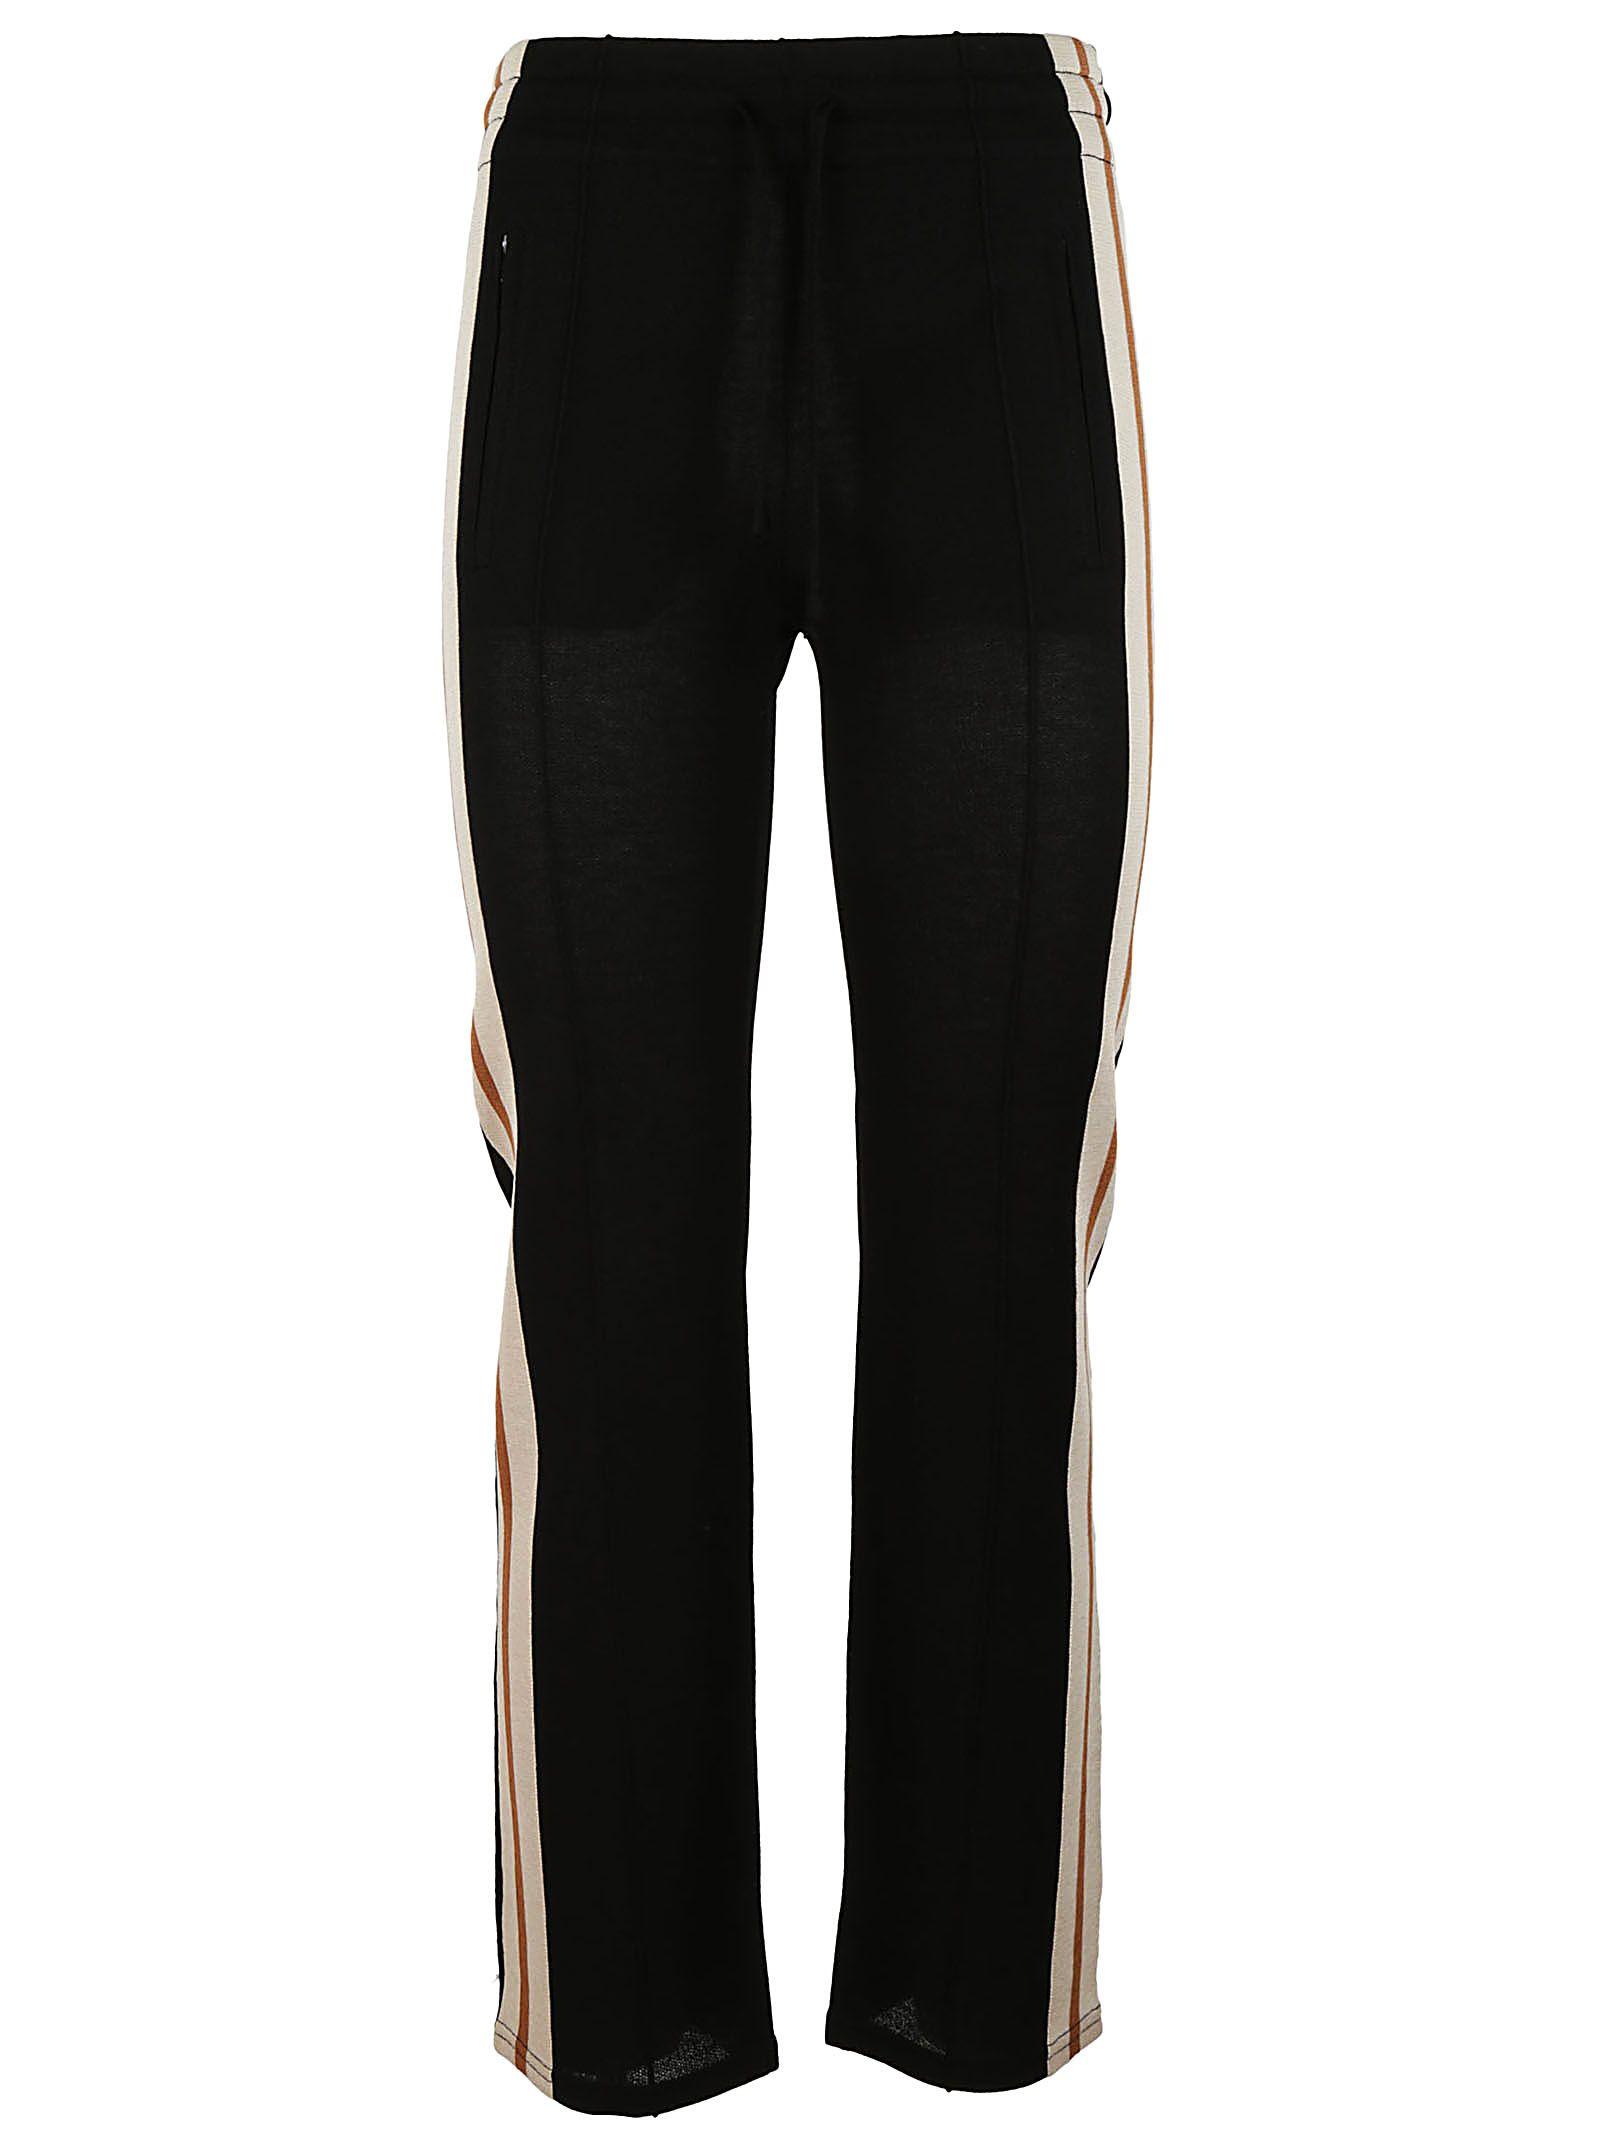 Isabel Marant Dobbs Trousers